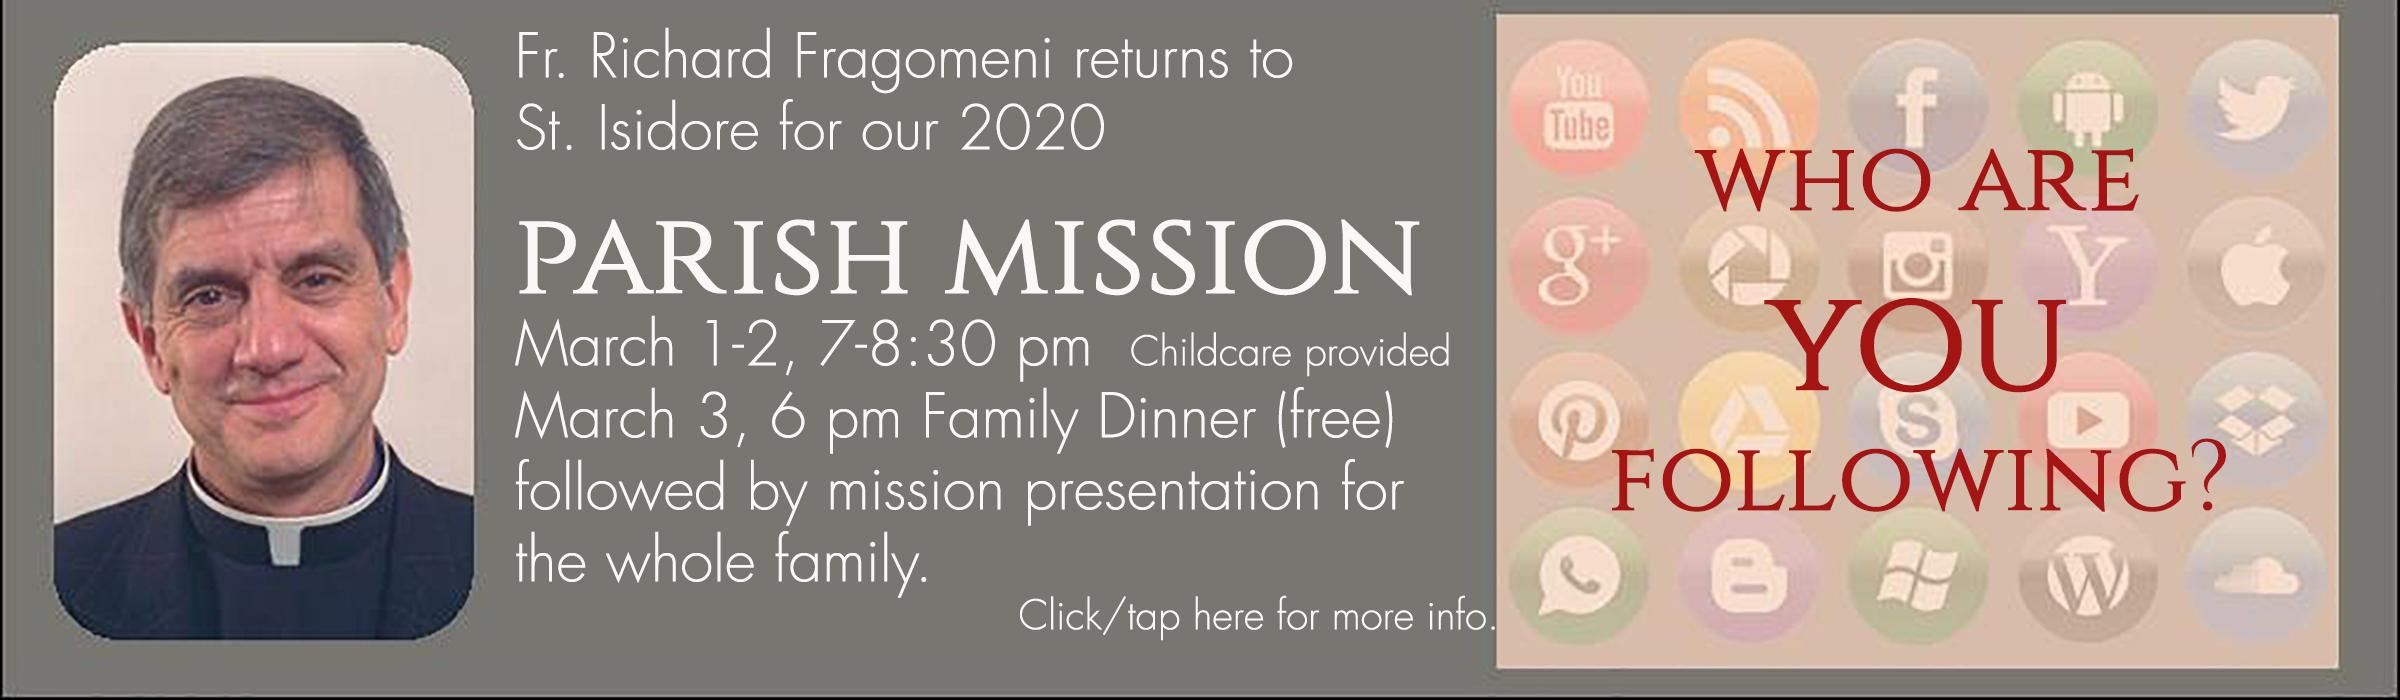 parish mission 2020 slider